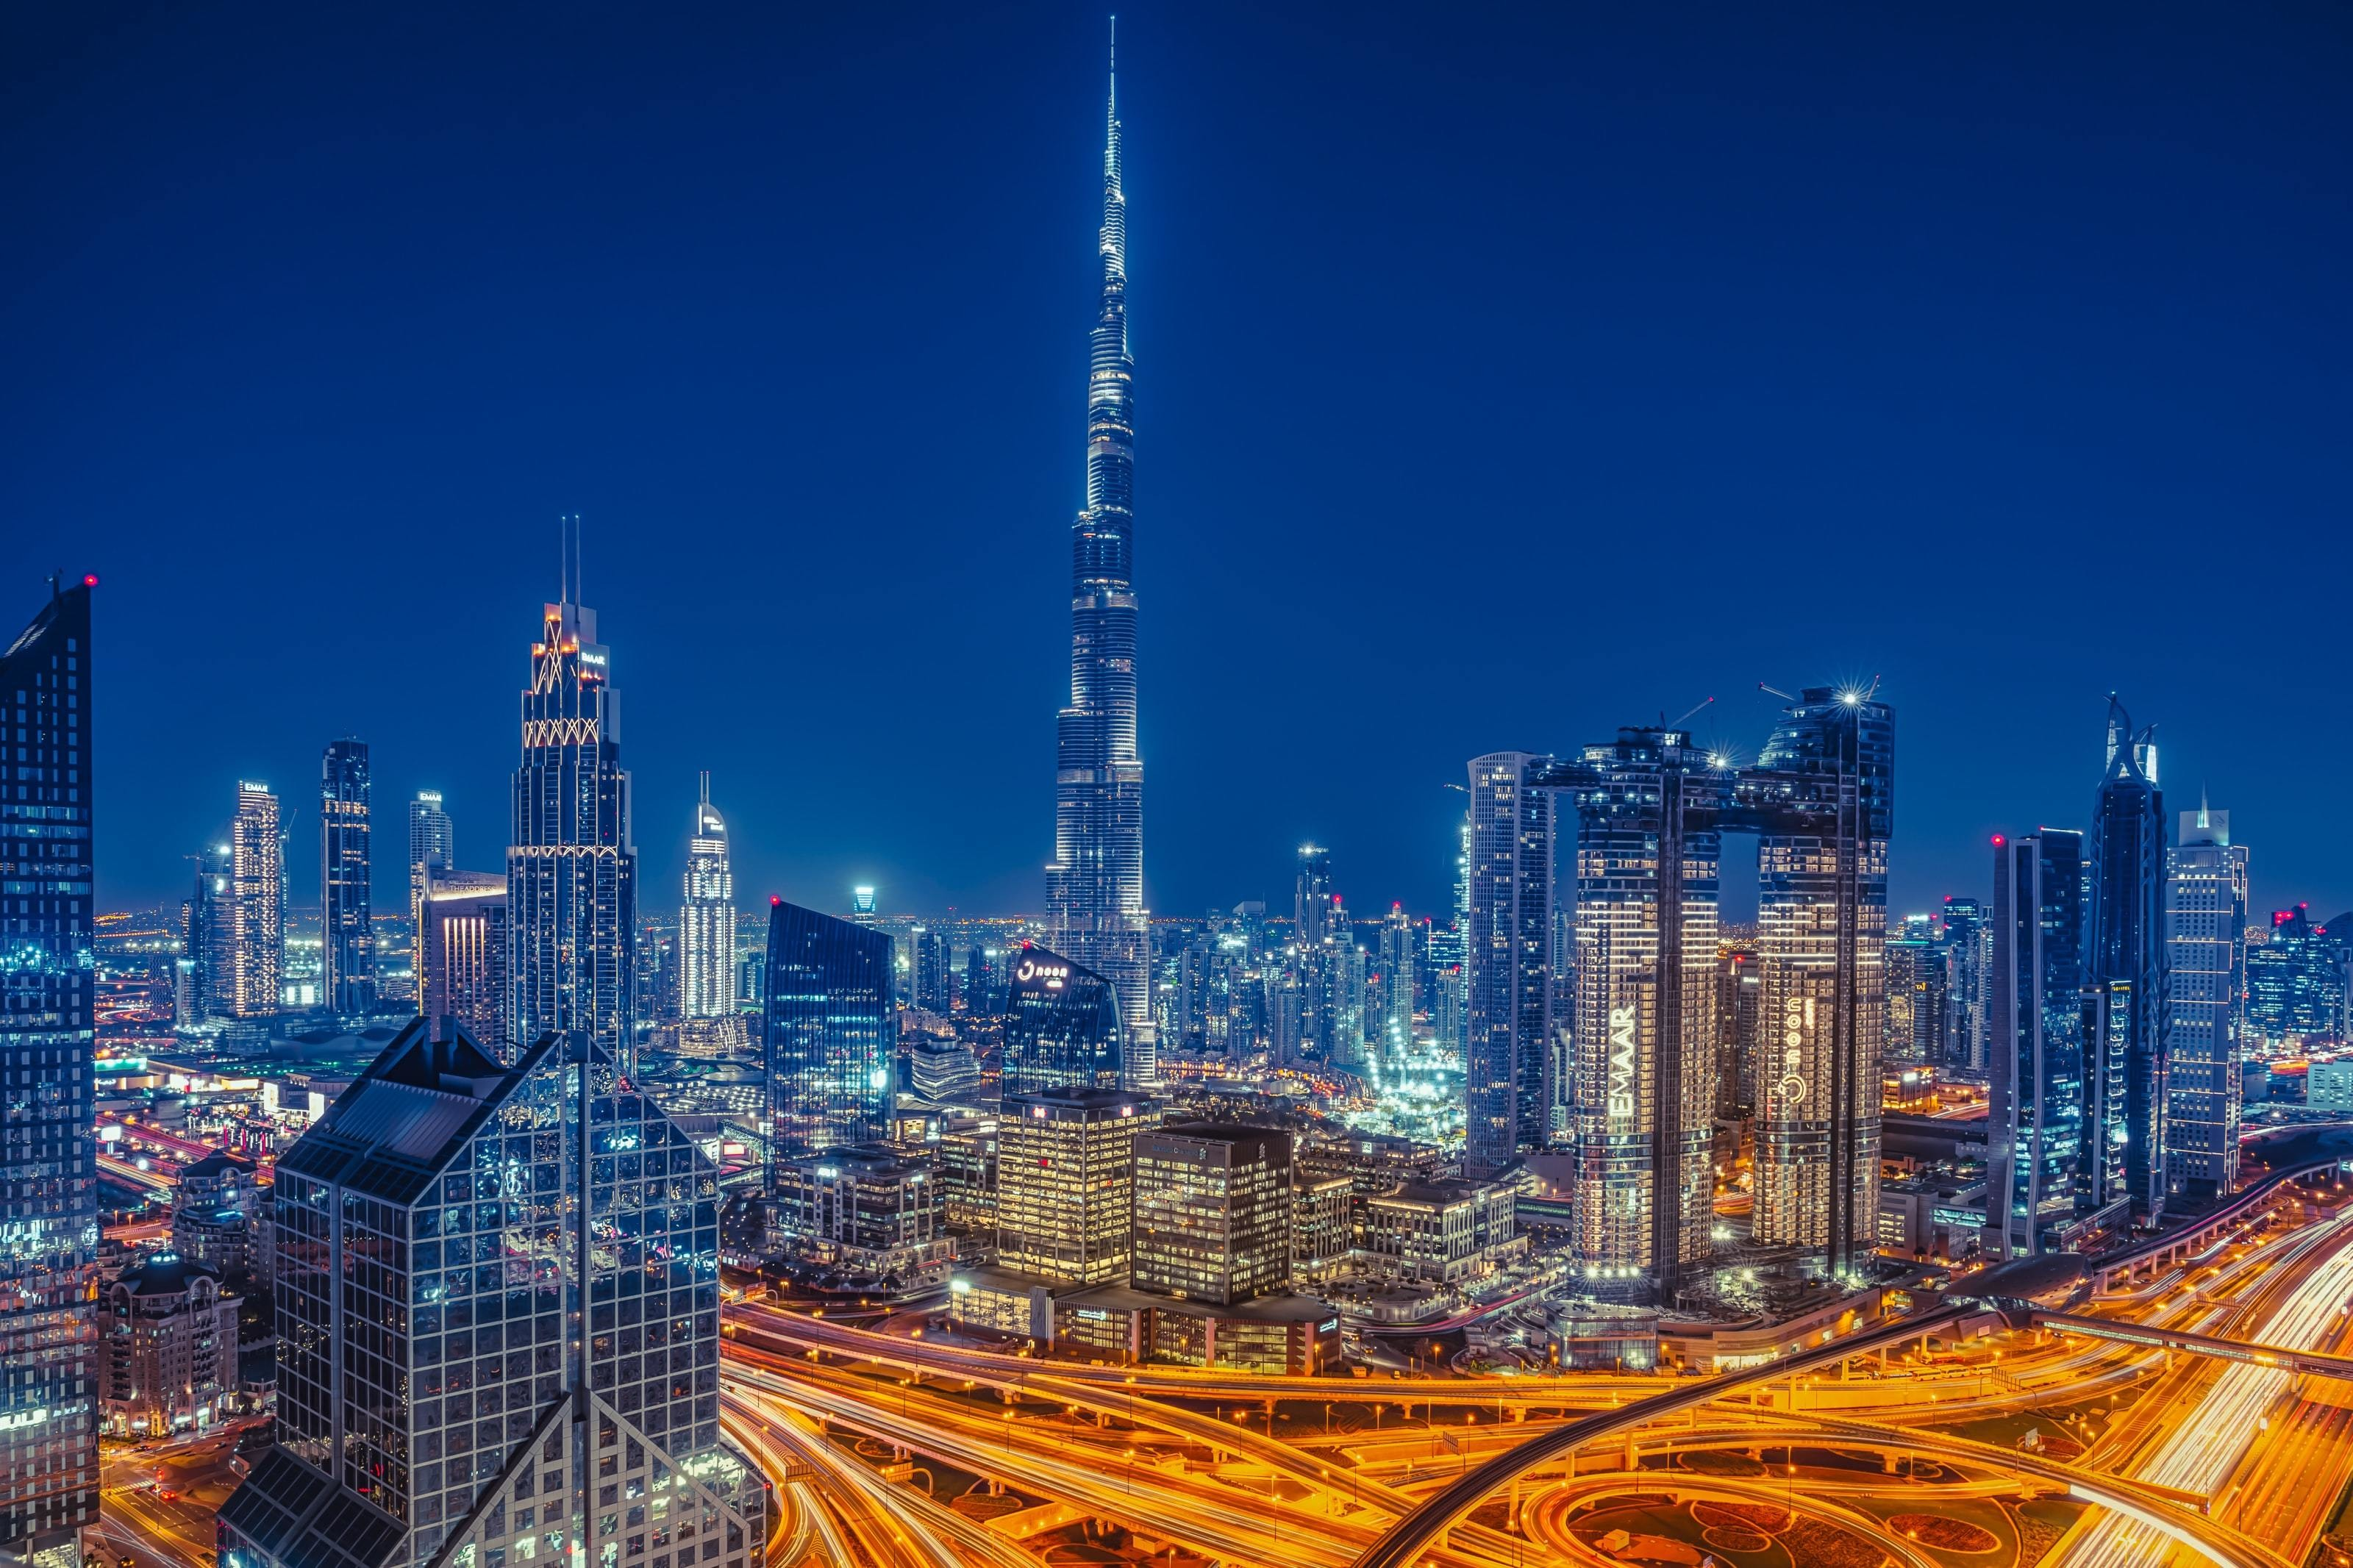 City skyscape of Dubai at night.